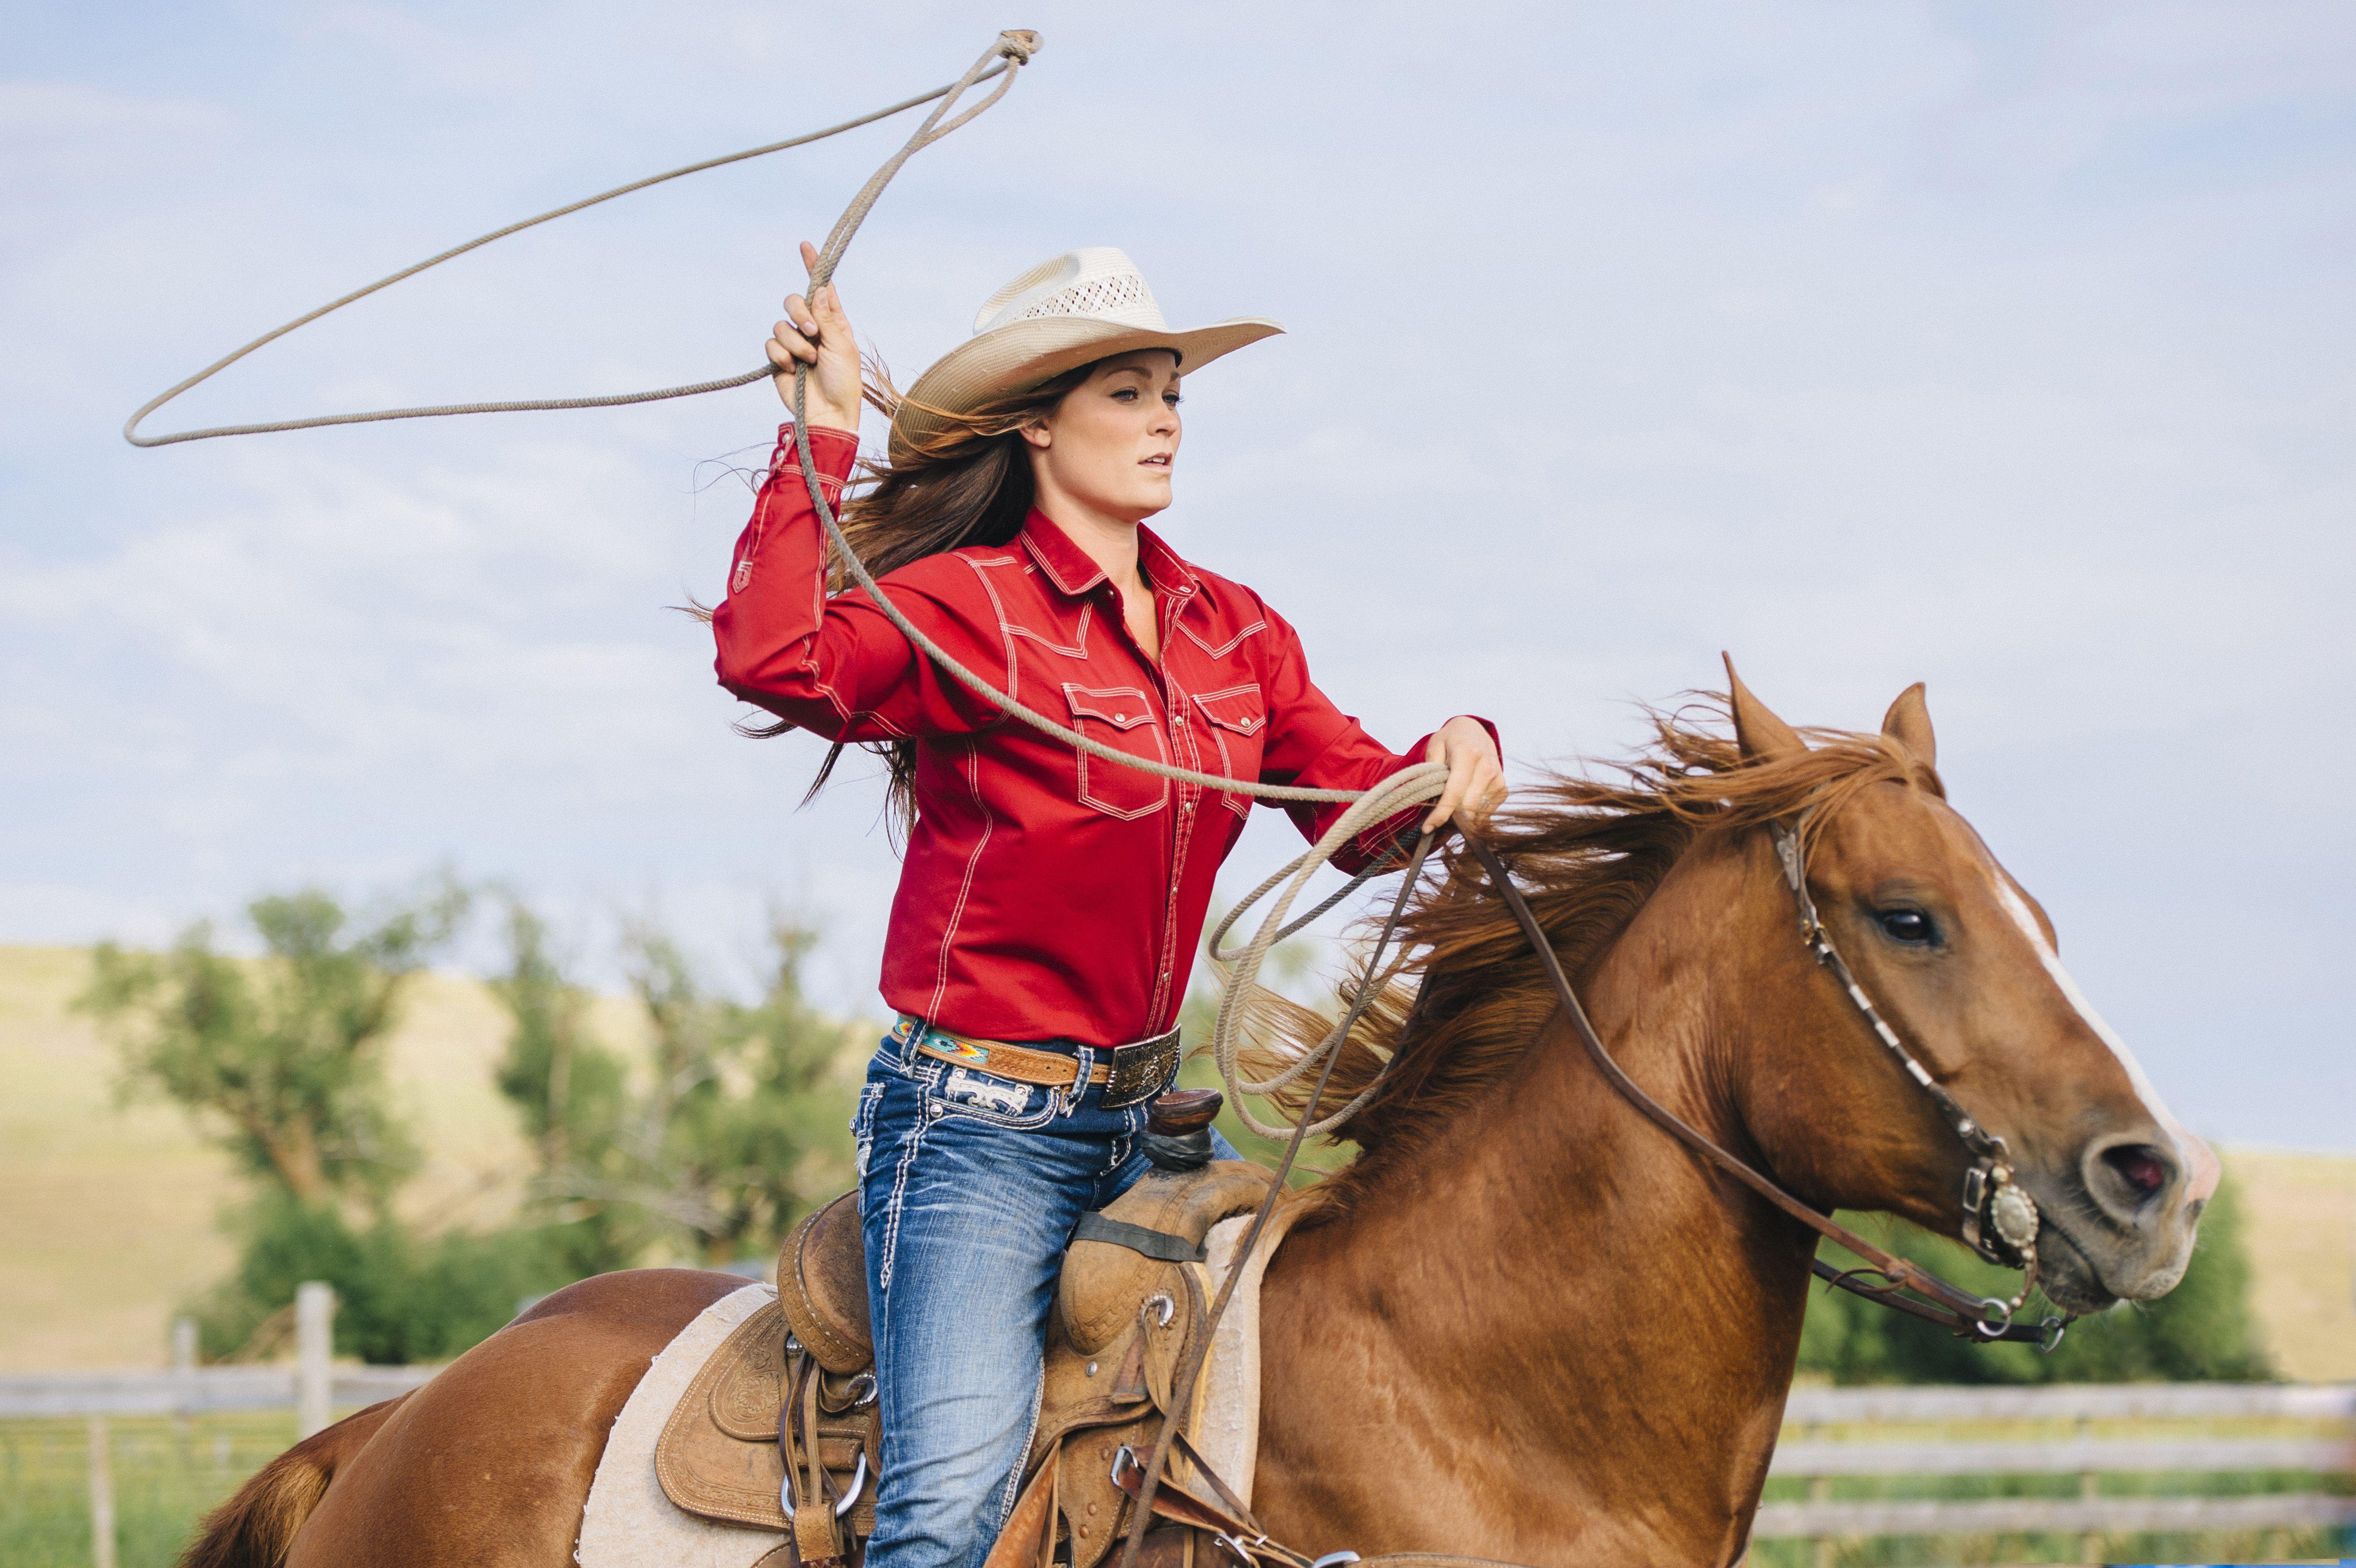 Caucasian cowgirl throwing lasso on horseback